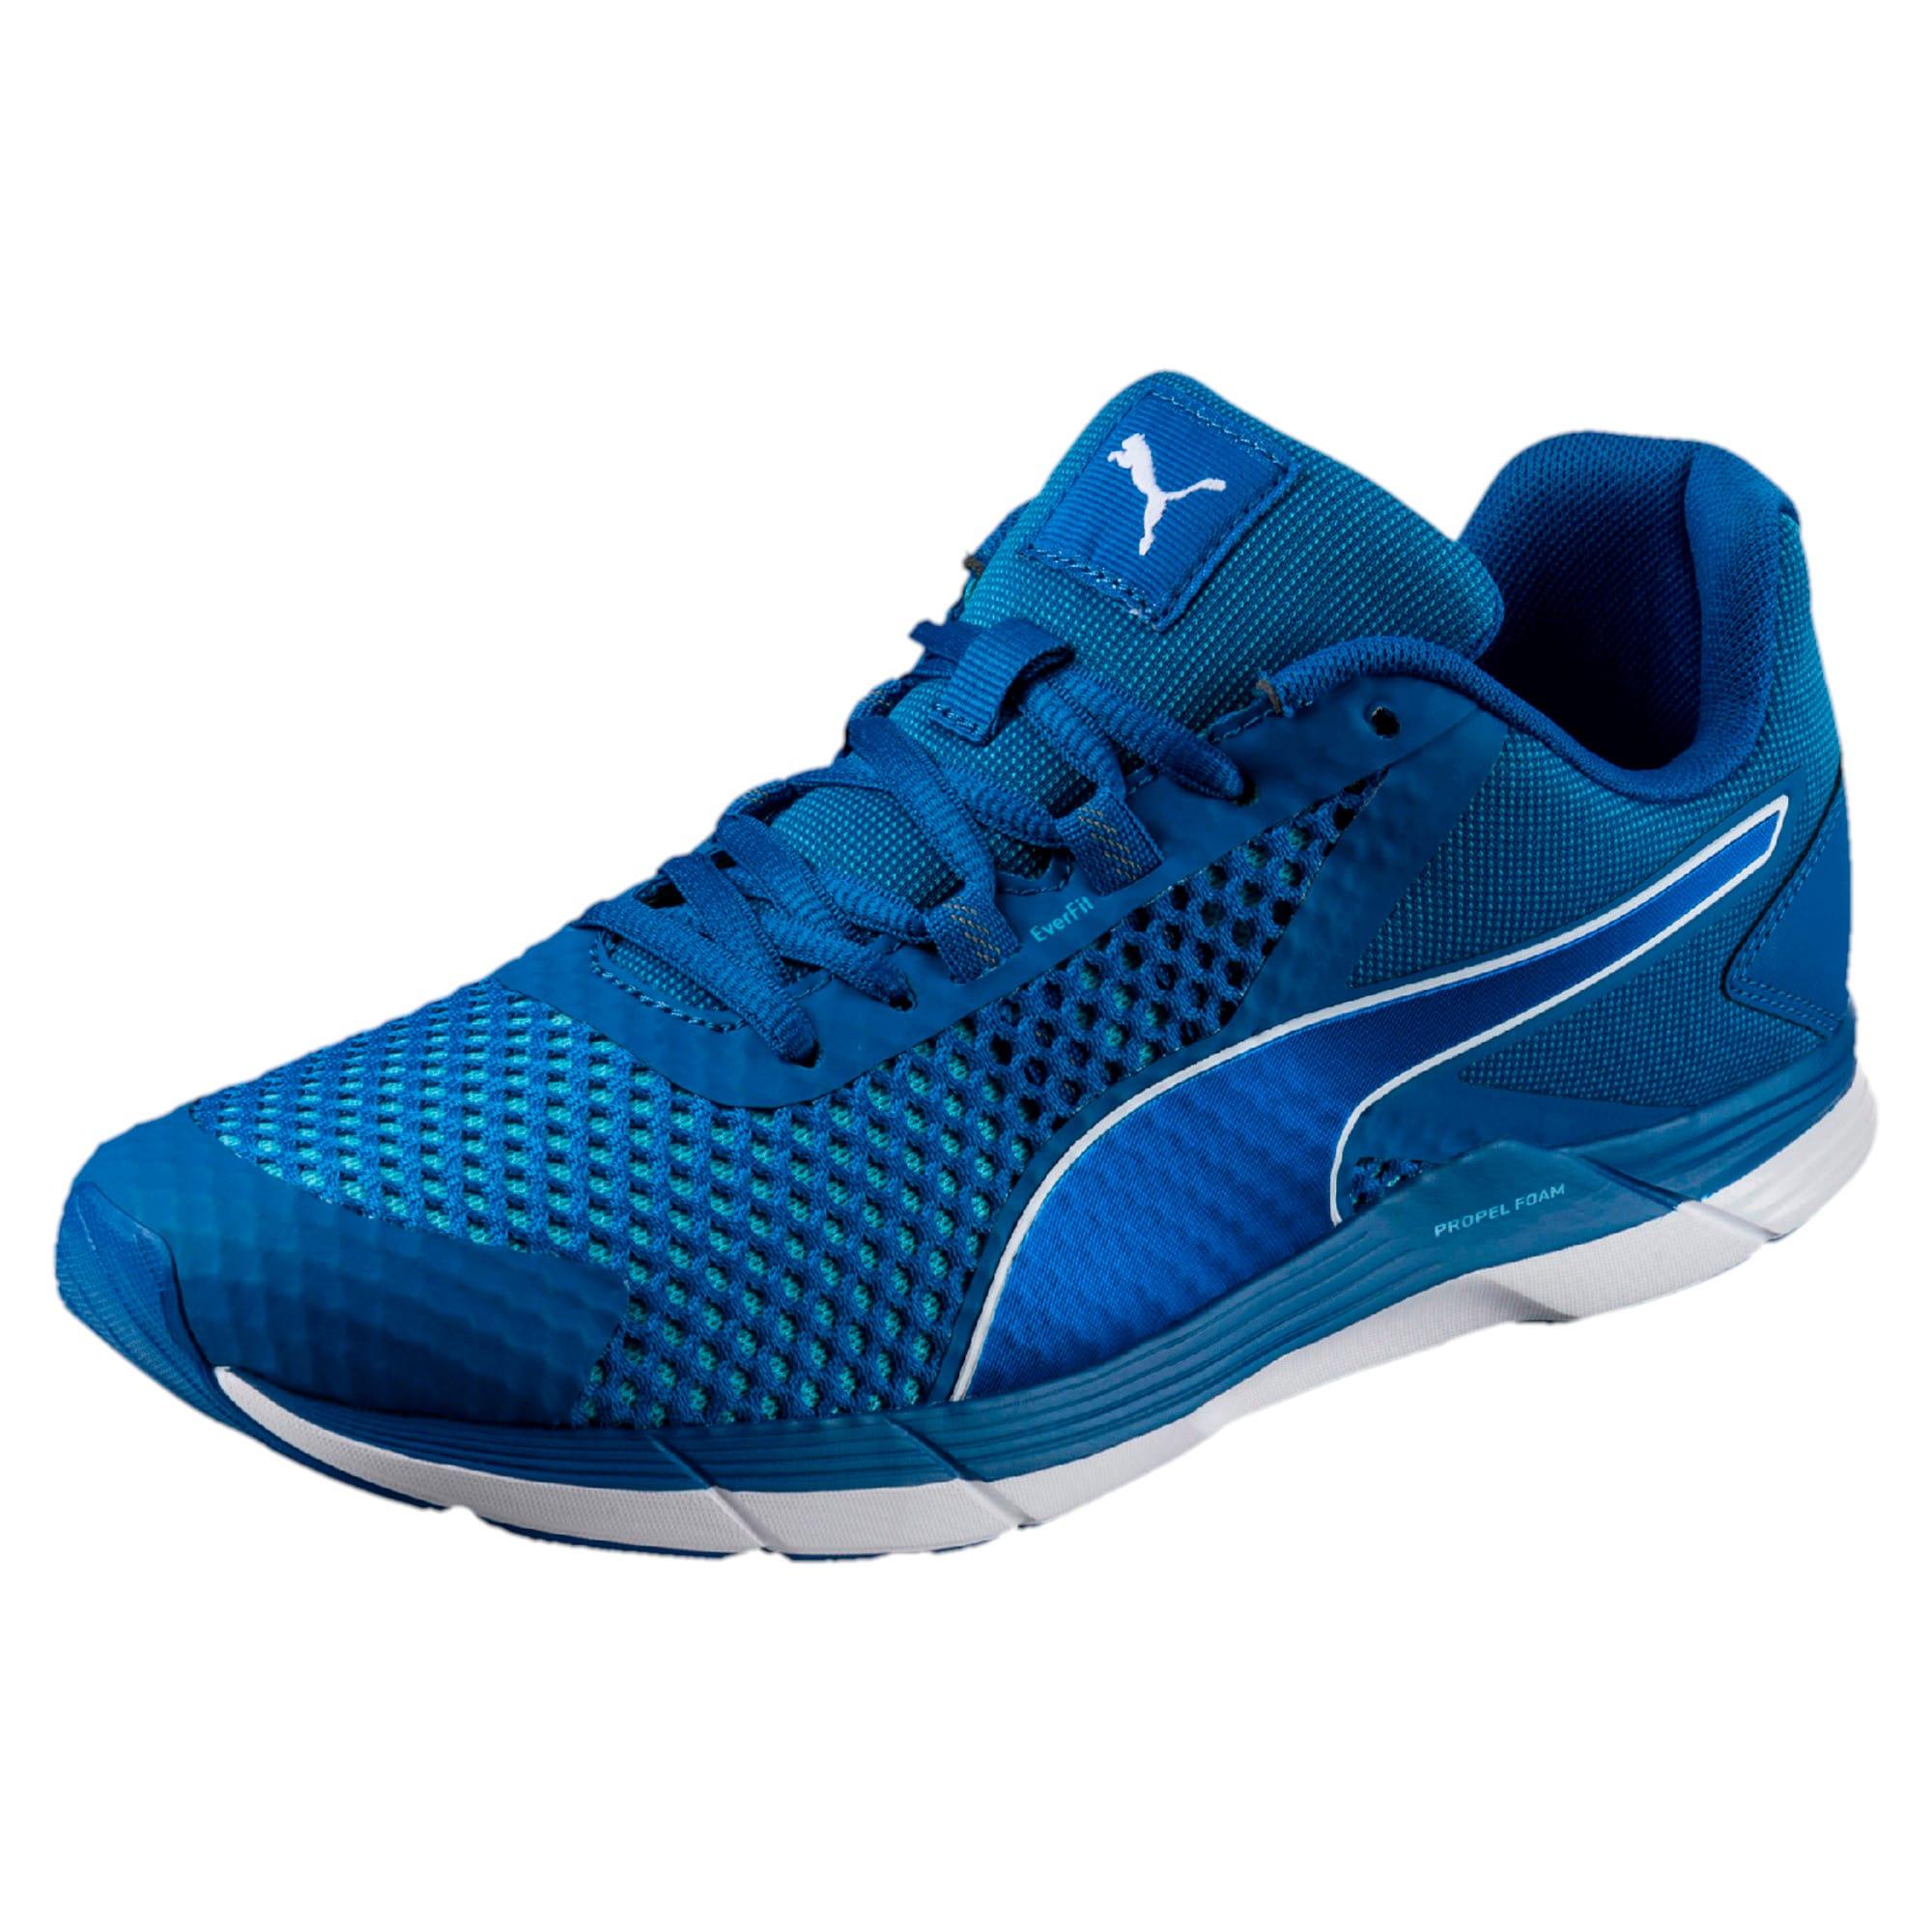 Thumbnail 1 of Propel 2 Men's Running Shoes, Lapis Blue-Turquoise-White, medium-IND